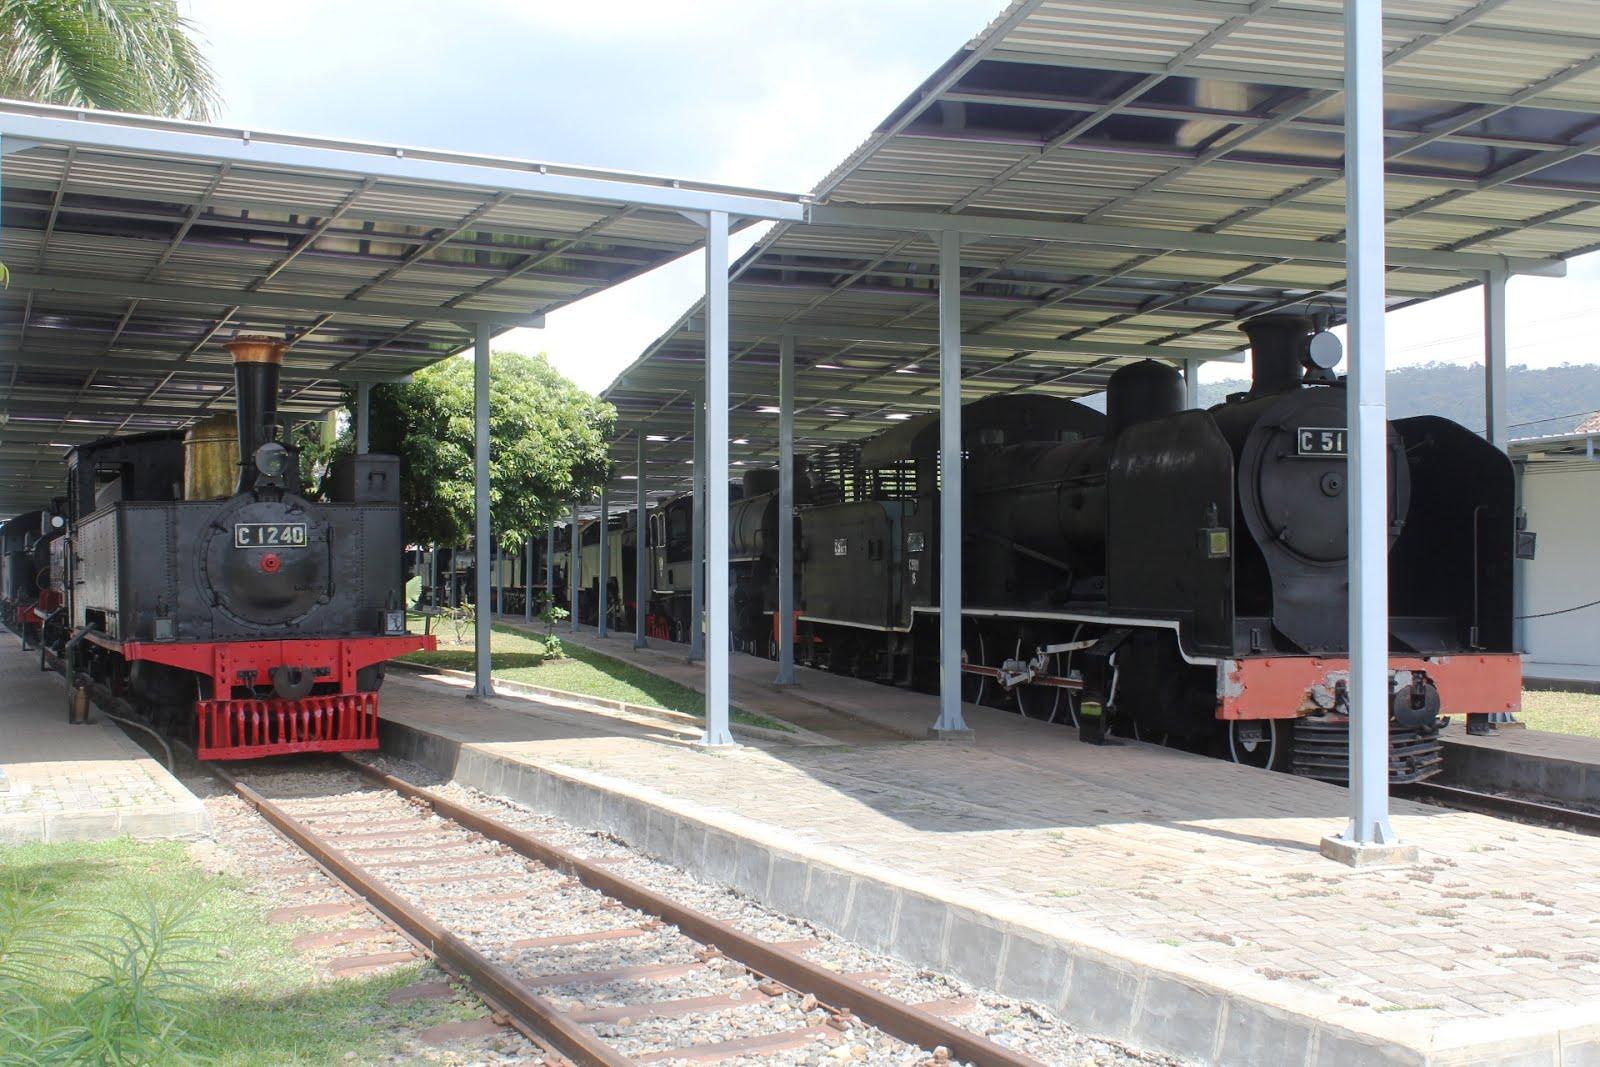 Catatan Unique Museum Kereta Api Ambarawa Belajar Sejarah Kab Semarang